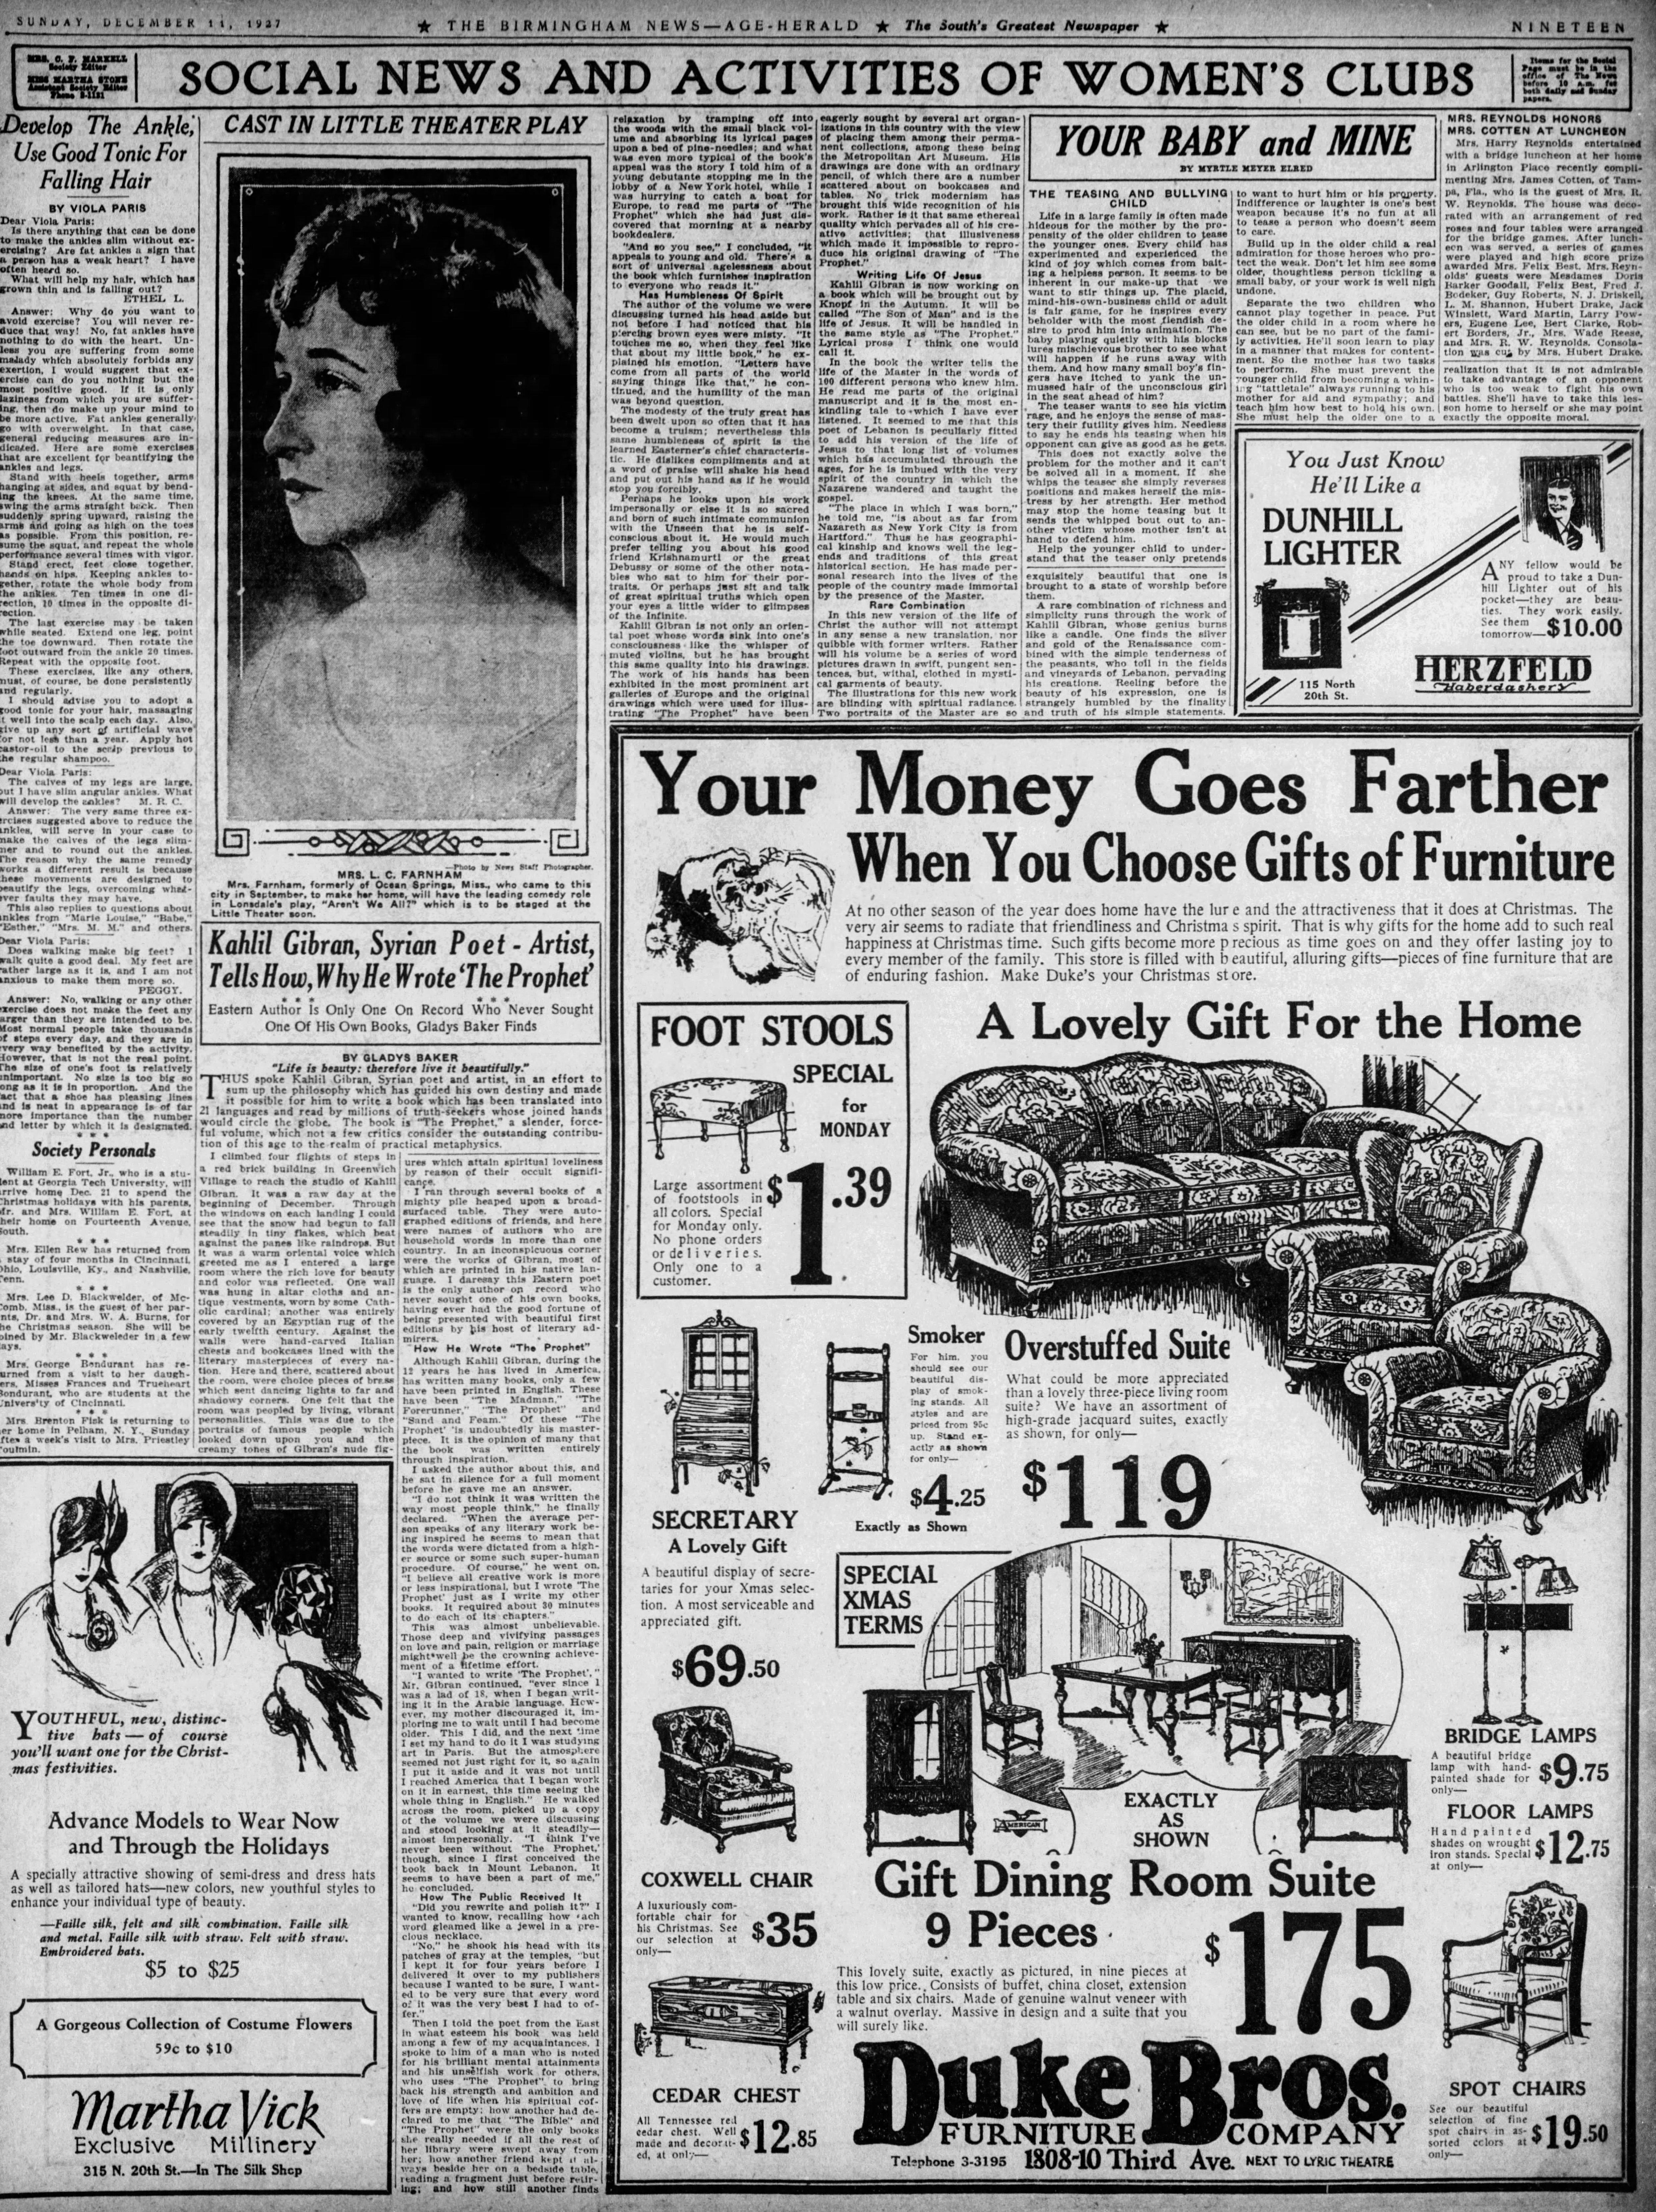 "Gladys Baker, ""Kahlil Gibran, Syrian Poet-Artist, Tells How, Why He Wrote 'The Prophet'"", The Birmingham News, Sunday, December 11, 1927, p. 19."